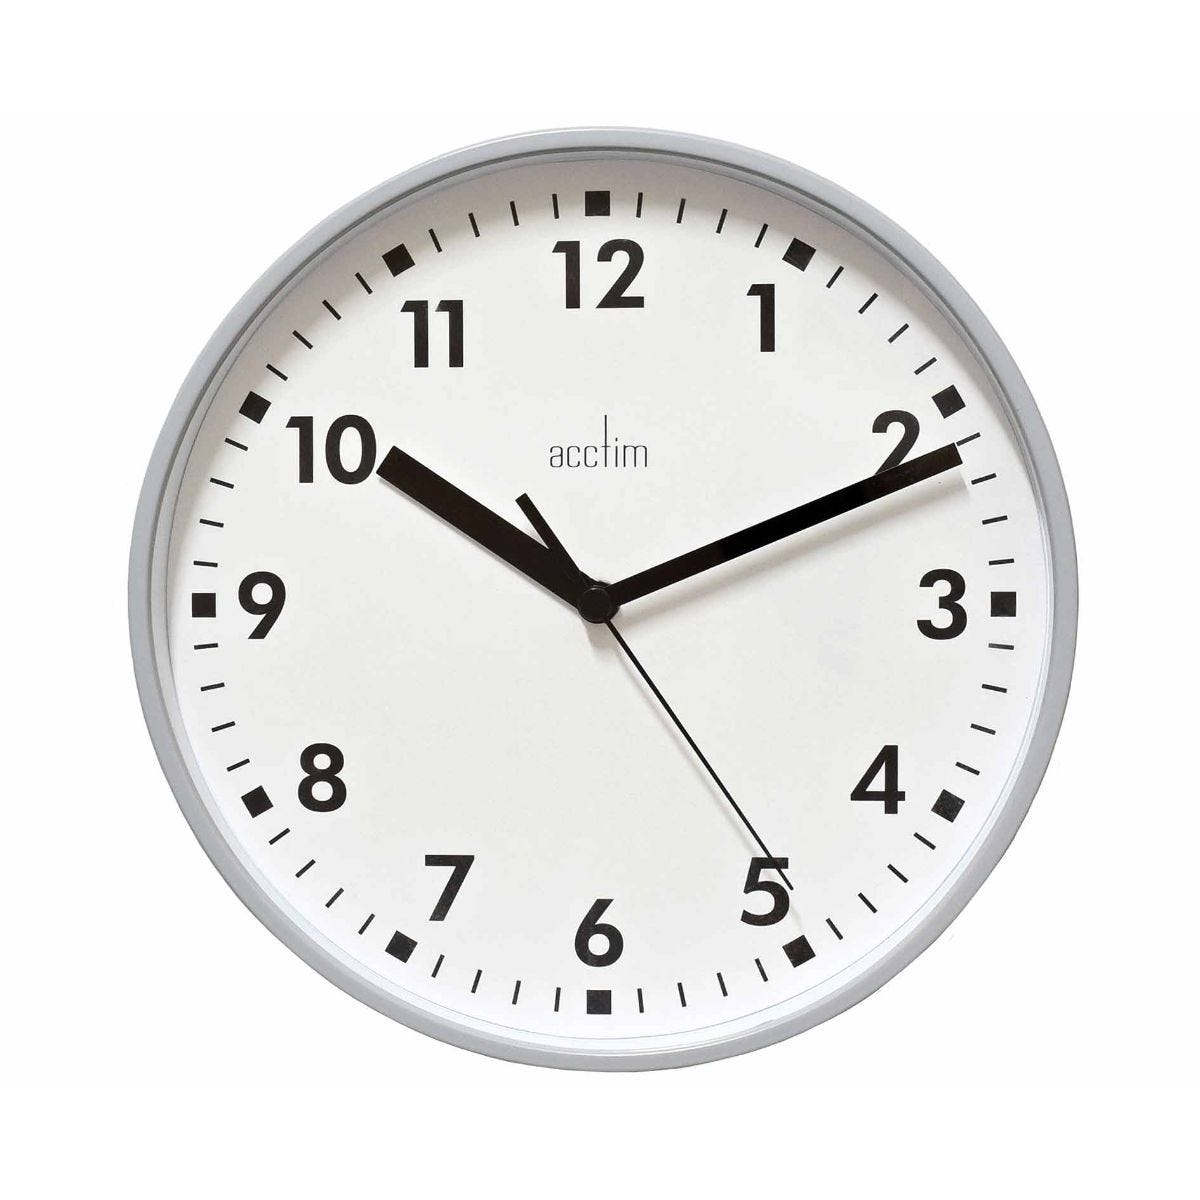 Buy Clocks Wall Clocks Ryman